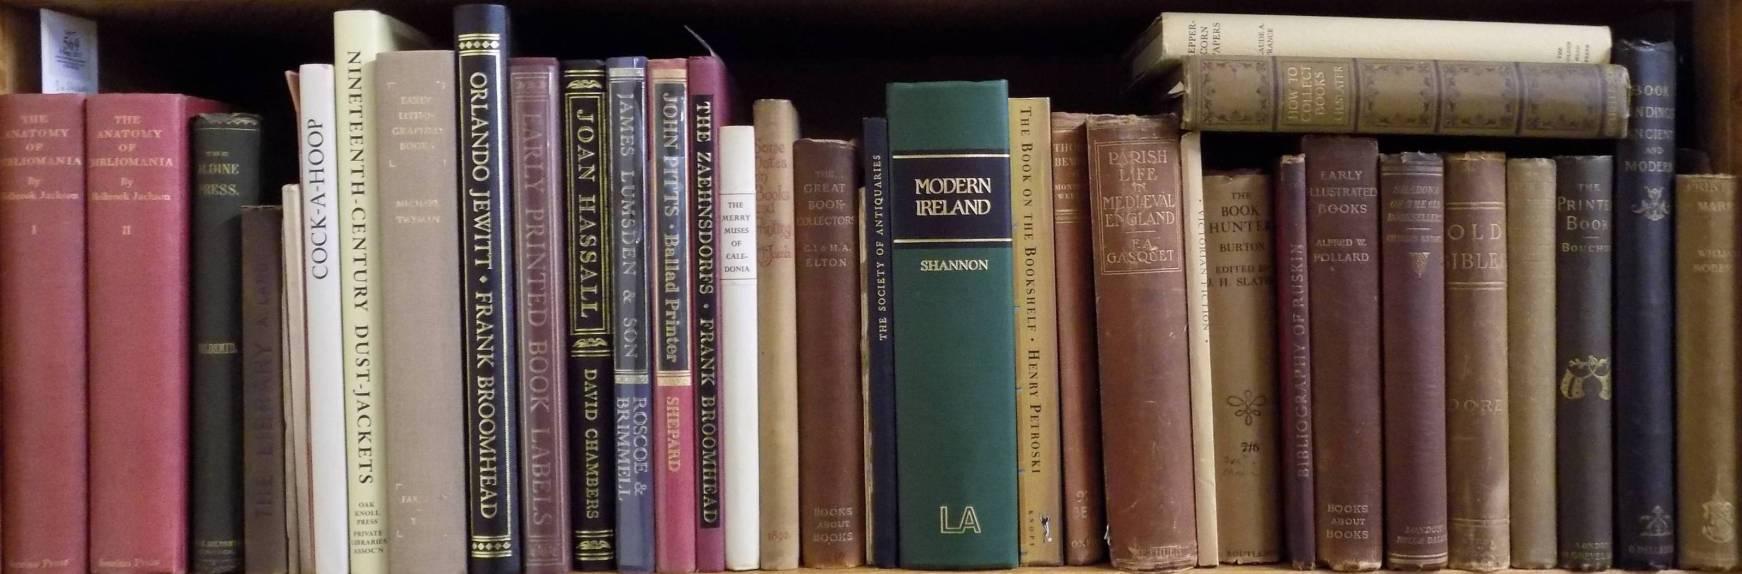 Jackson (Holbrook). The Anatomy of Bibliomania, volumes 1 & 2, The ...